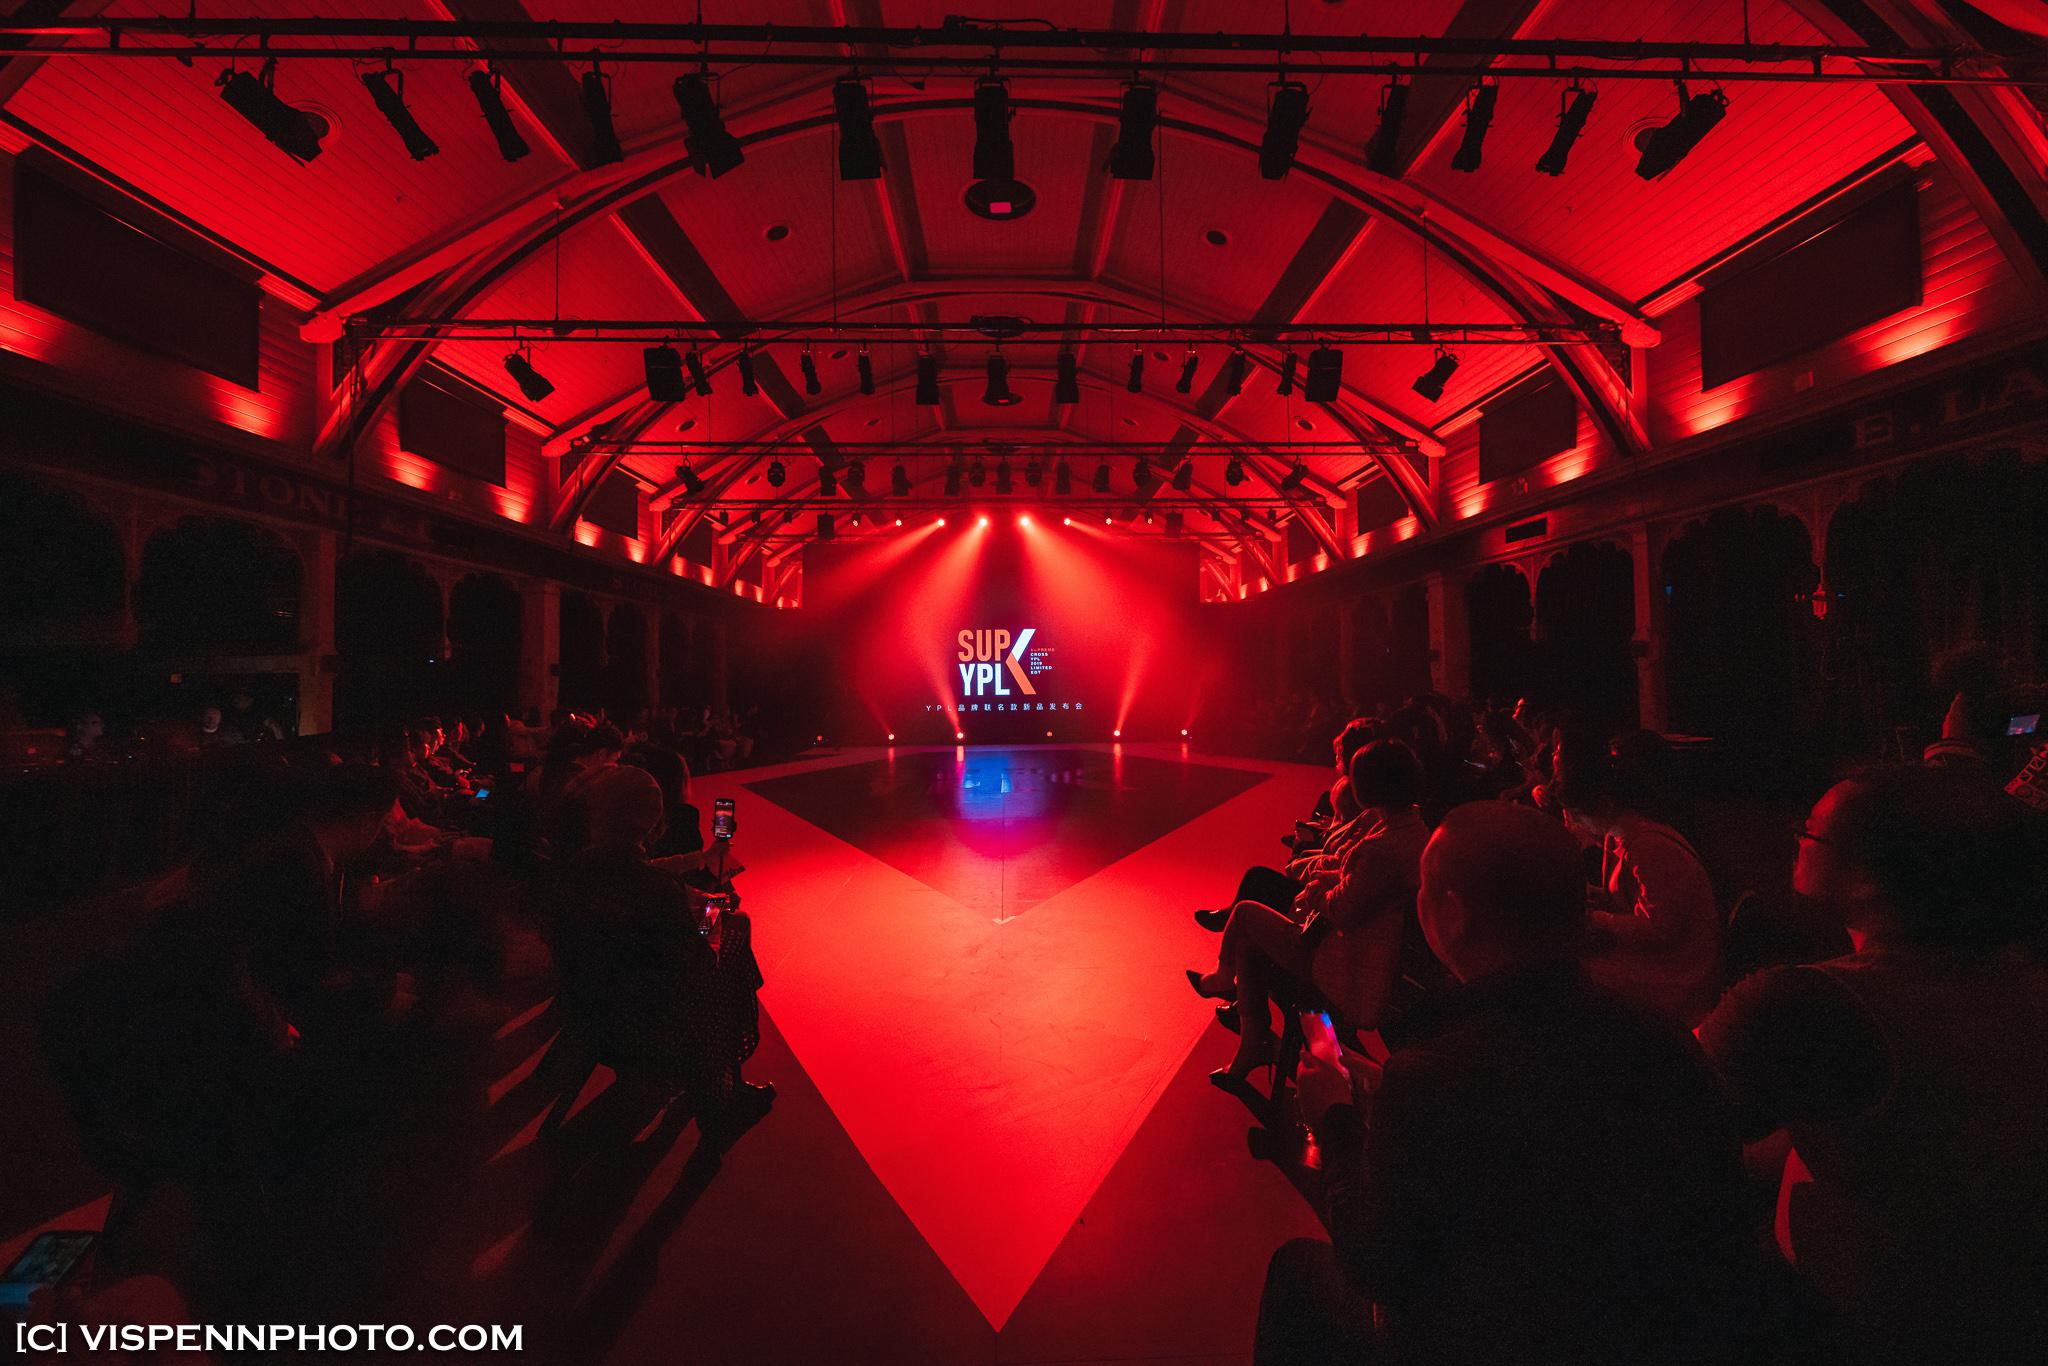 Melbourne Events Photography VISPENN 墨尔本 活动摄影 年会拍摄 YPL 1989 HSony VISPENN